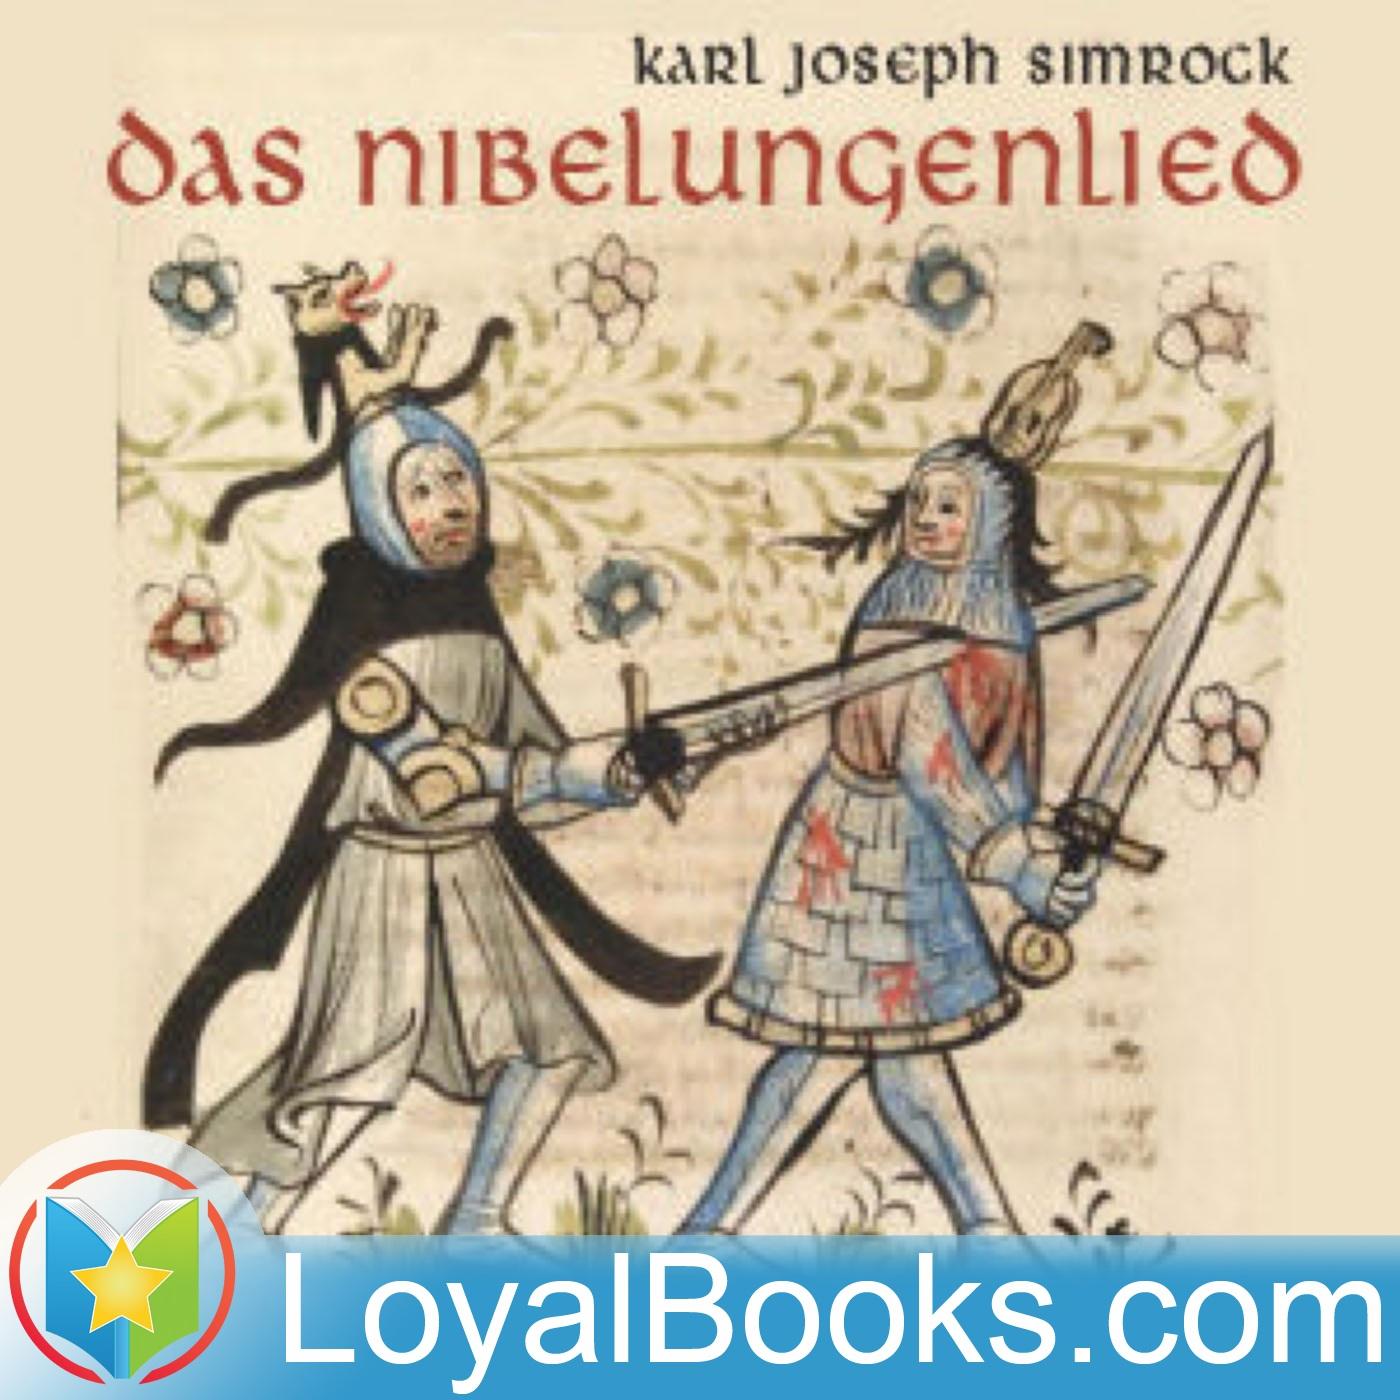 <![CDATA[Das Nibelungenlied by Karl Joseph Simrock]]>